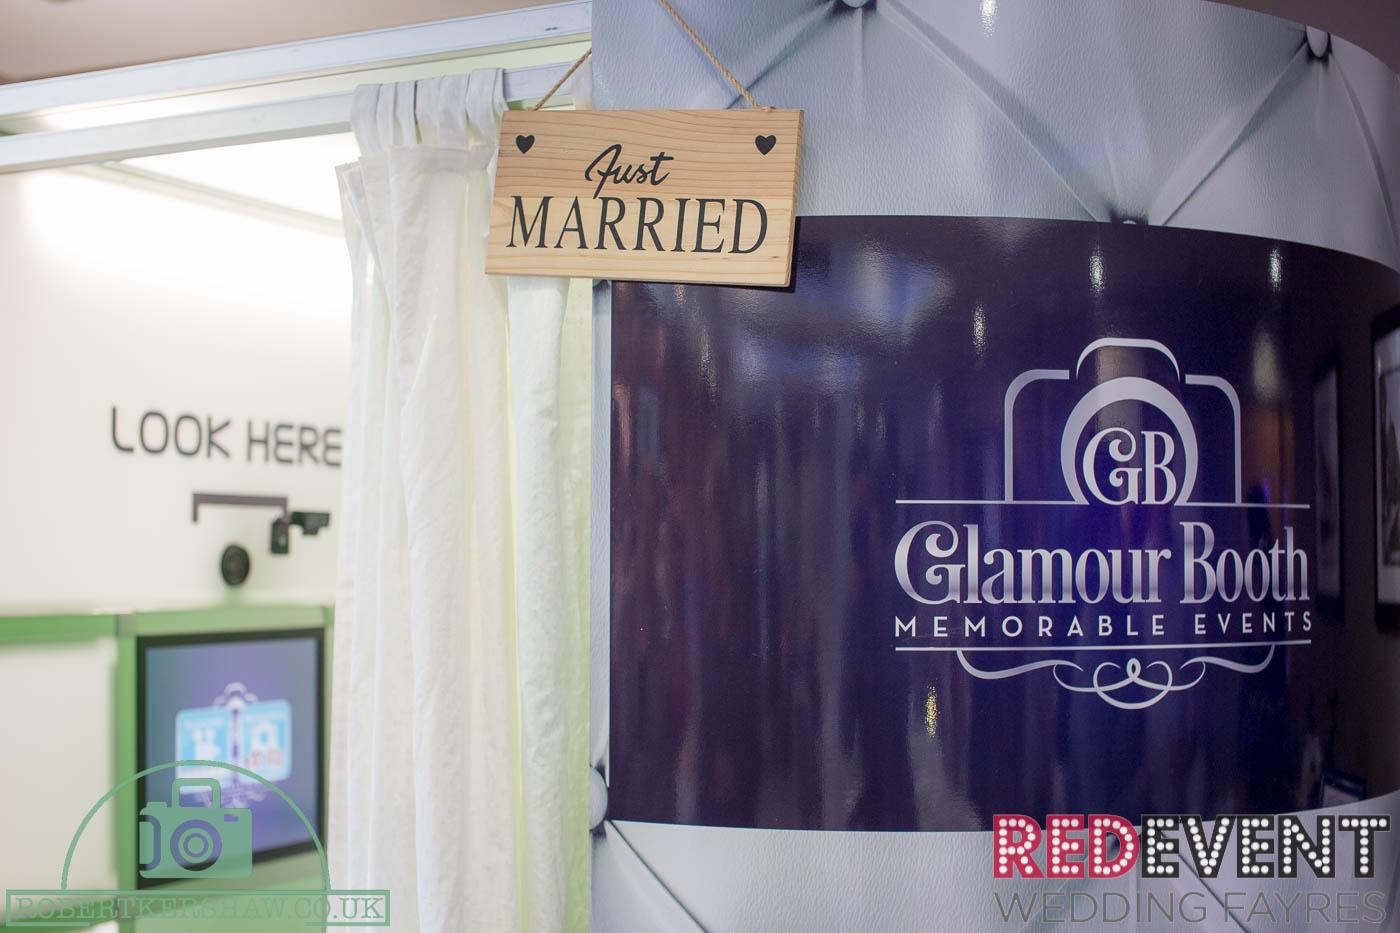 Glamour Booth RedEvent_HolidayInn www.redeventweddingfayres.com